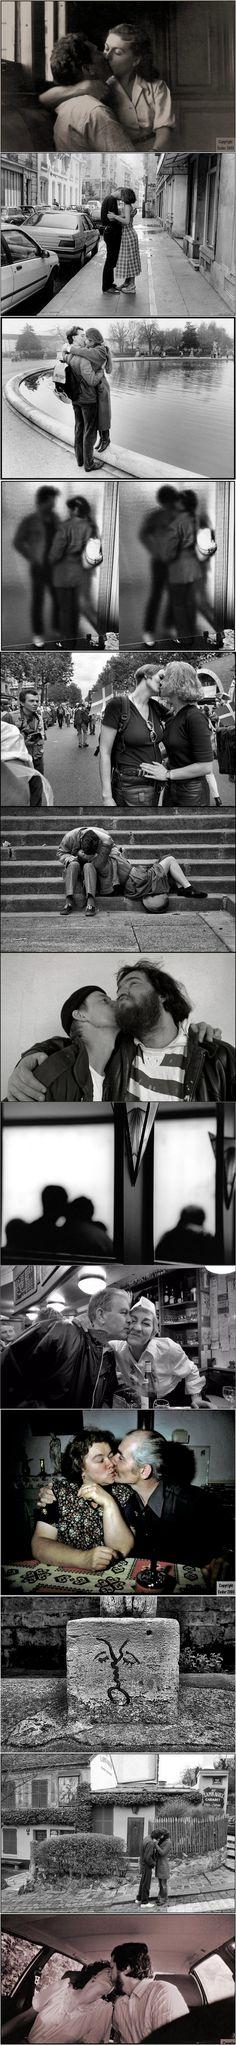 KISS ME by SUDOR.deviantart.com on @deviantART